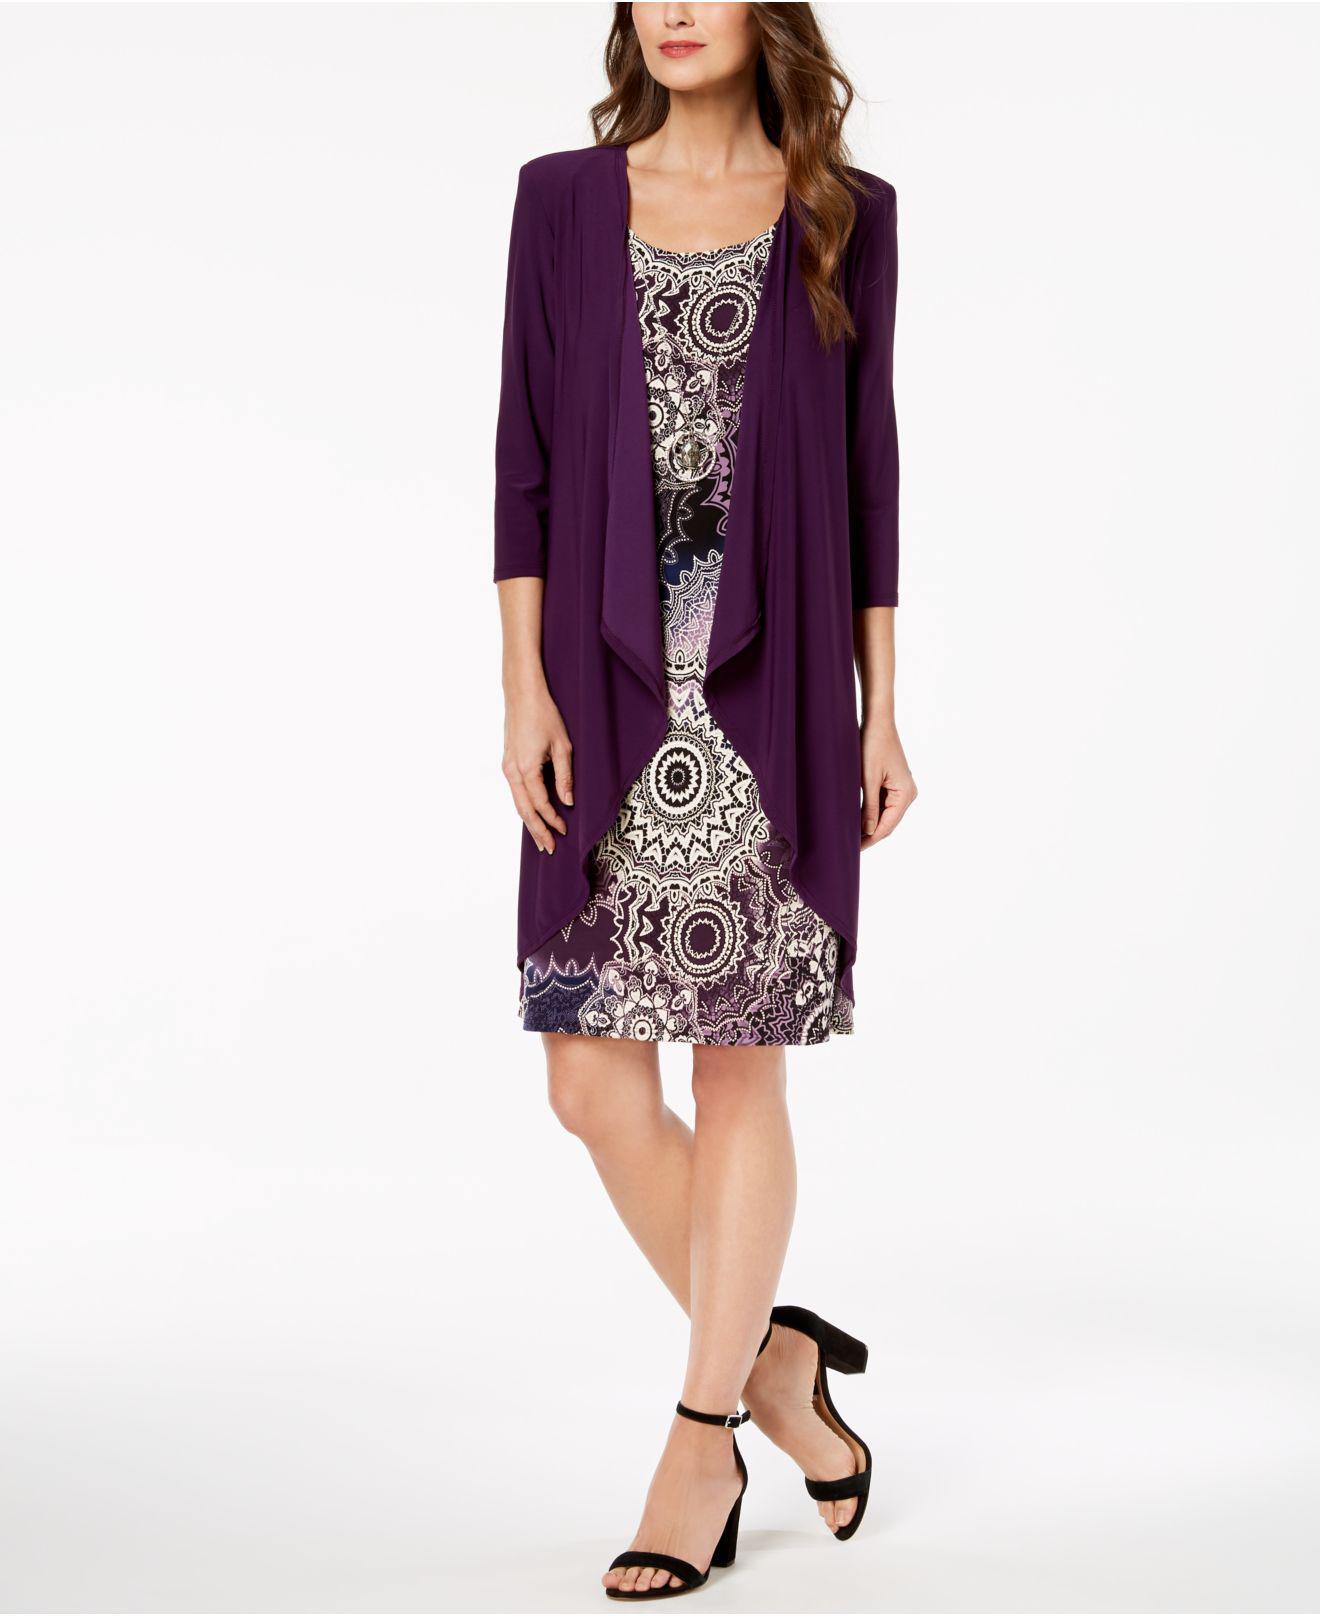 f7783549852 Petite Sheath Dress With Jacket - Data Dynamic AG